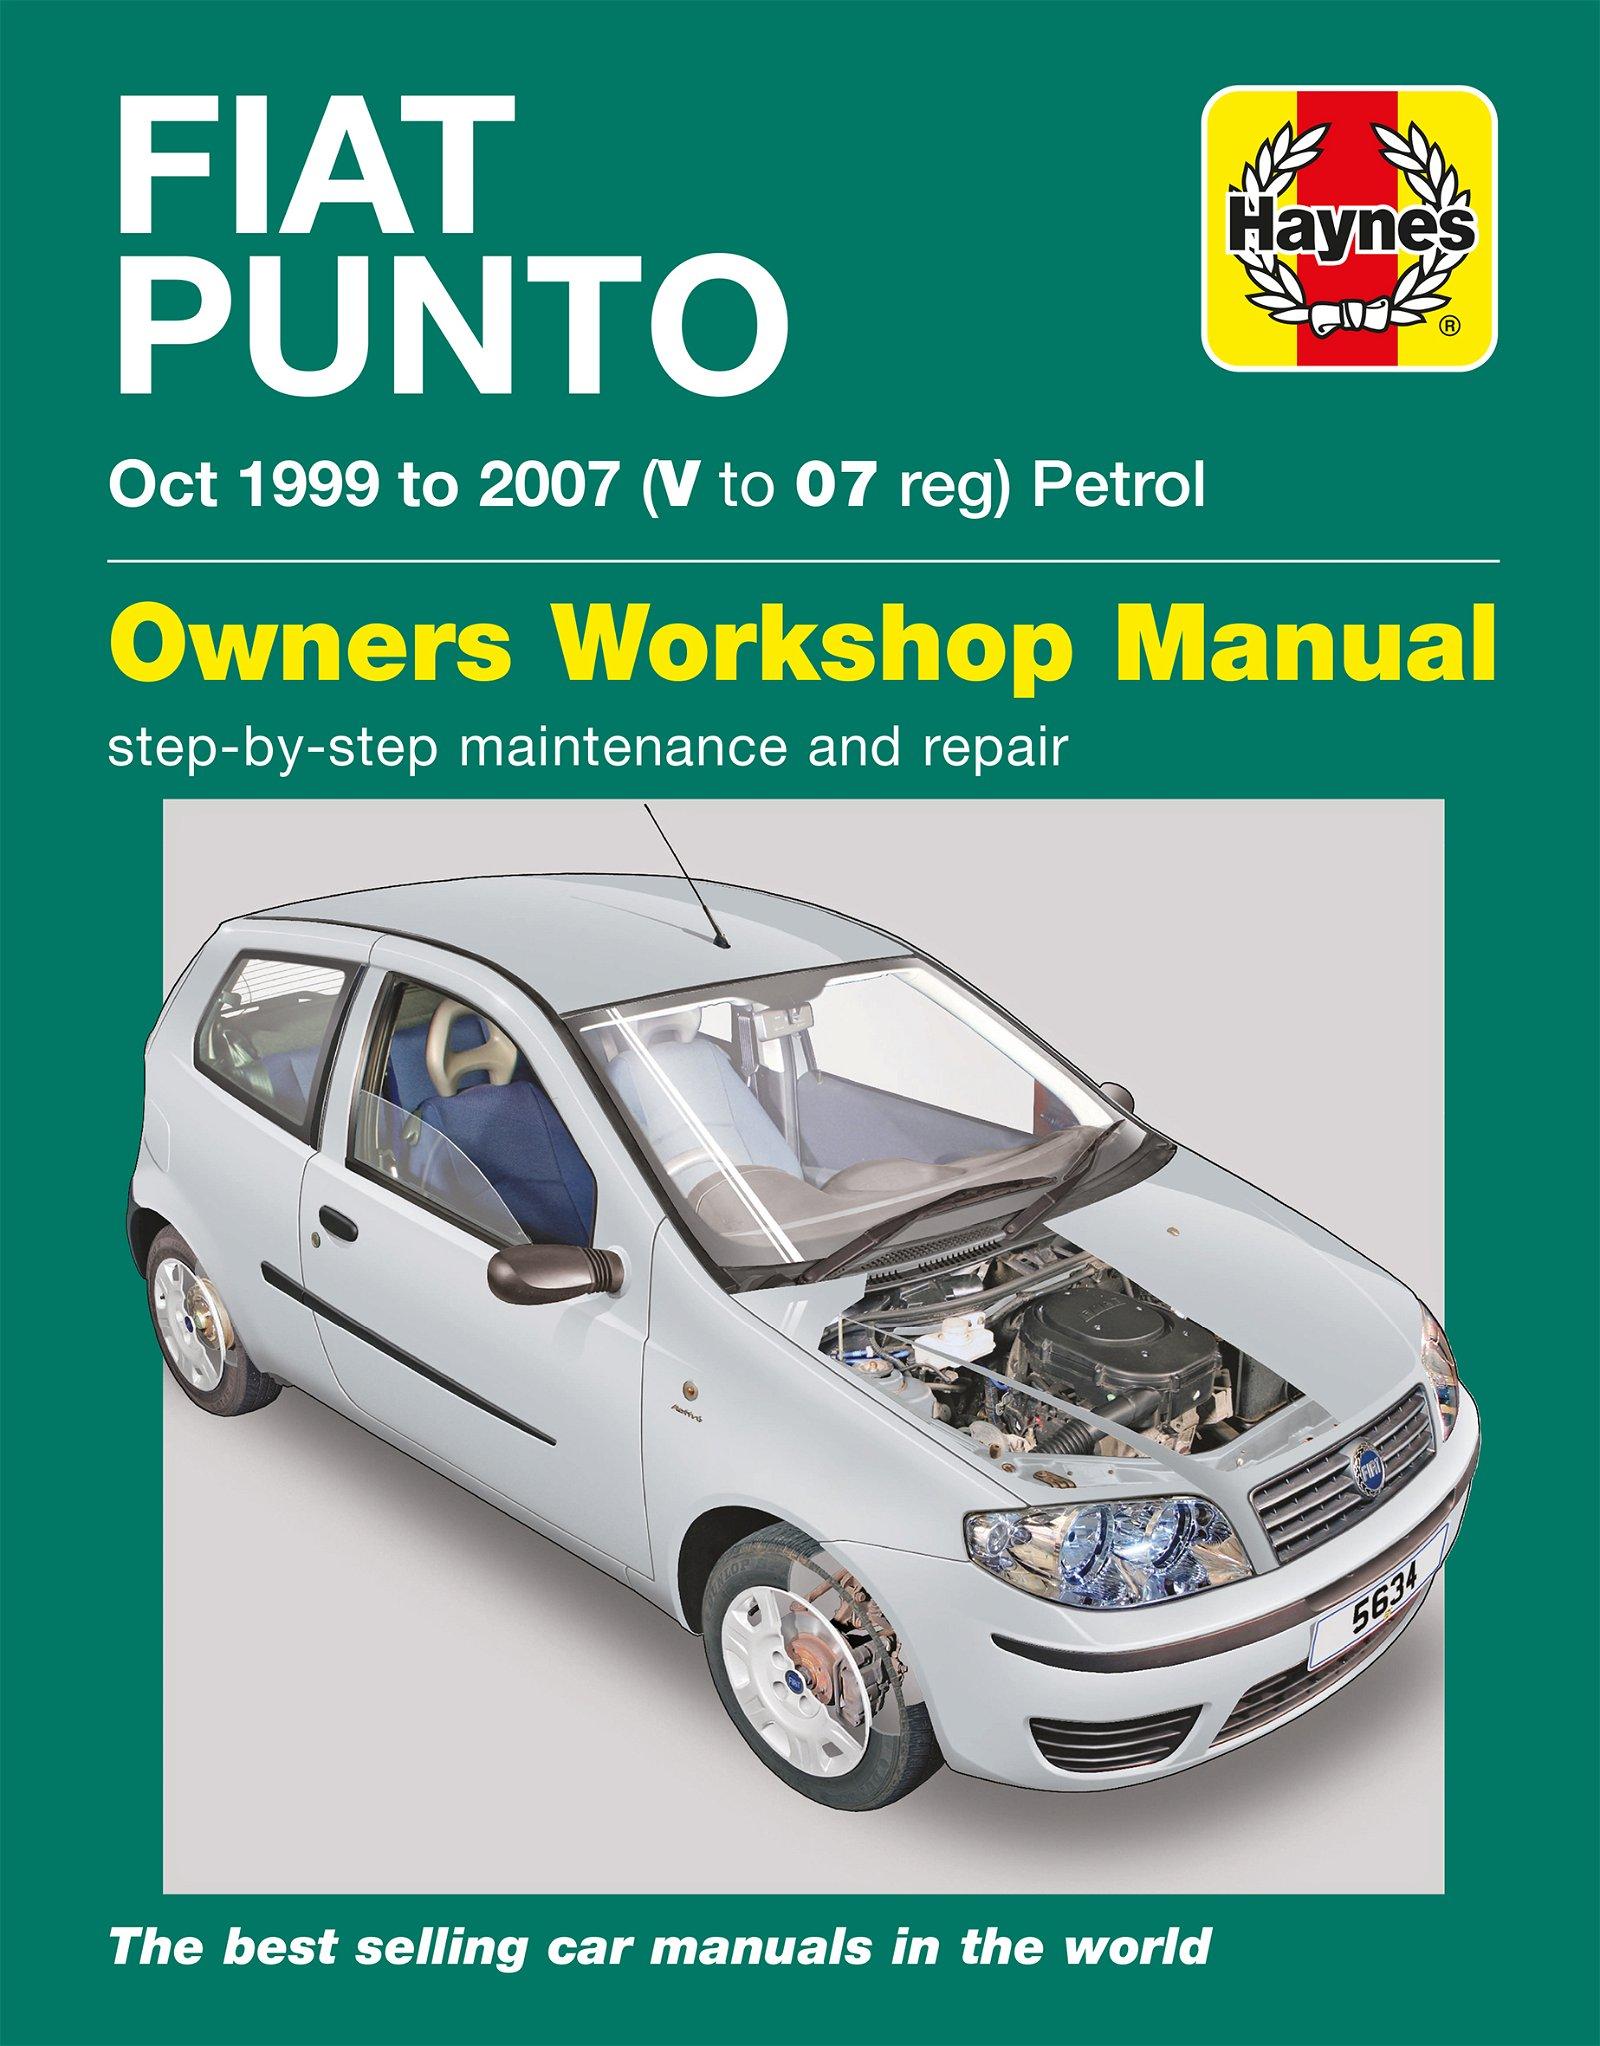 [Manuel UK en Anglais] Fiat Punto Petrol  (Oct 99 - 07)  V to 07